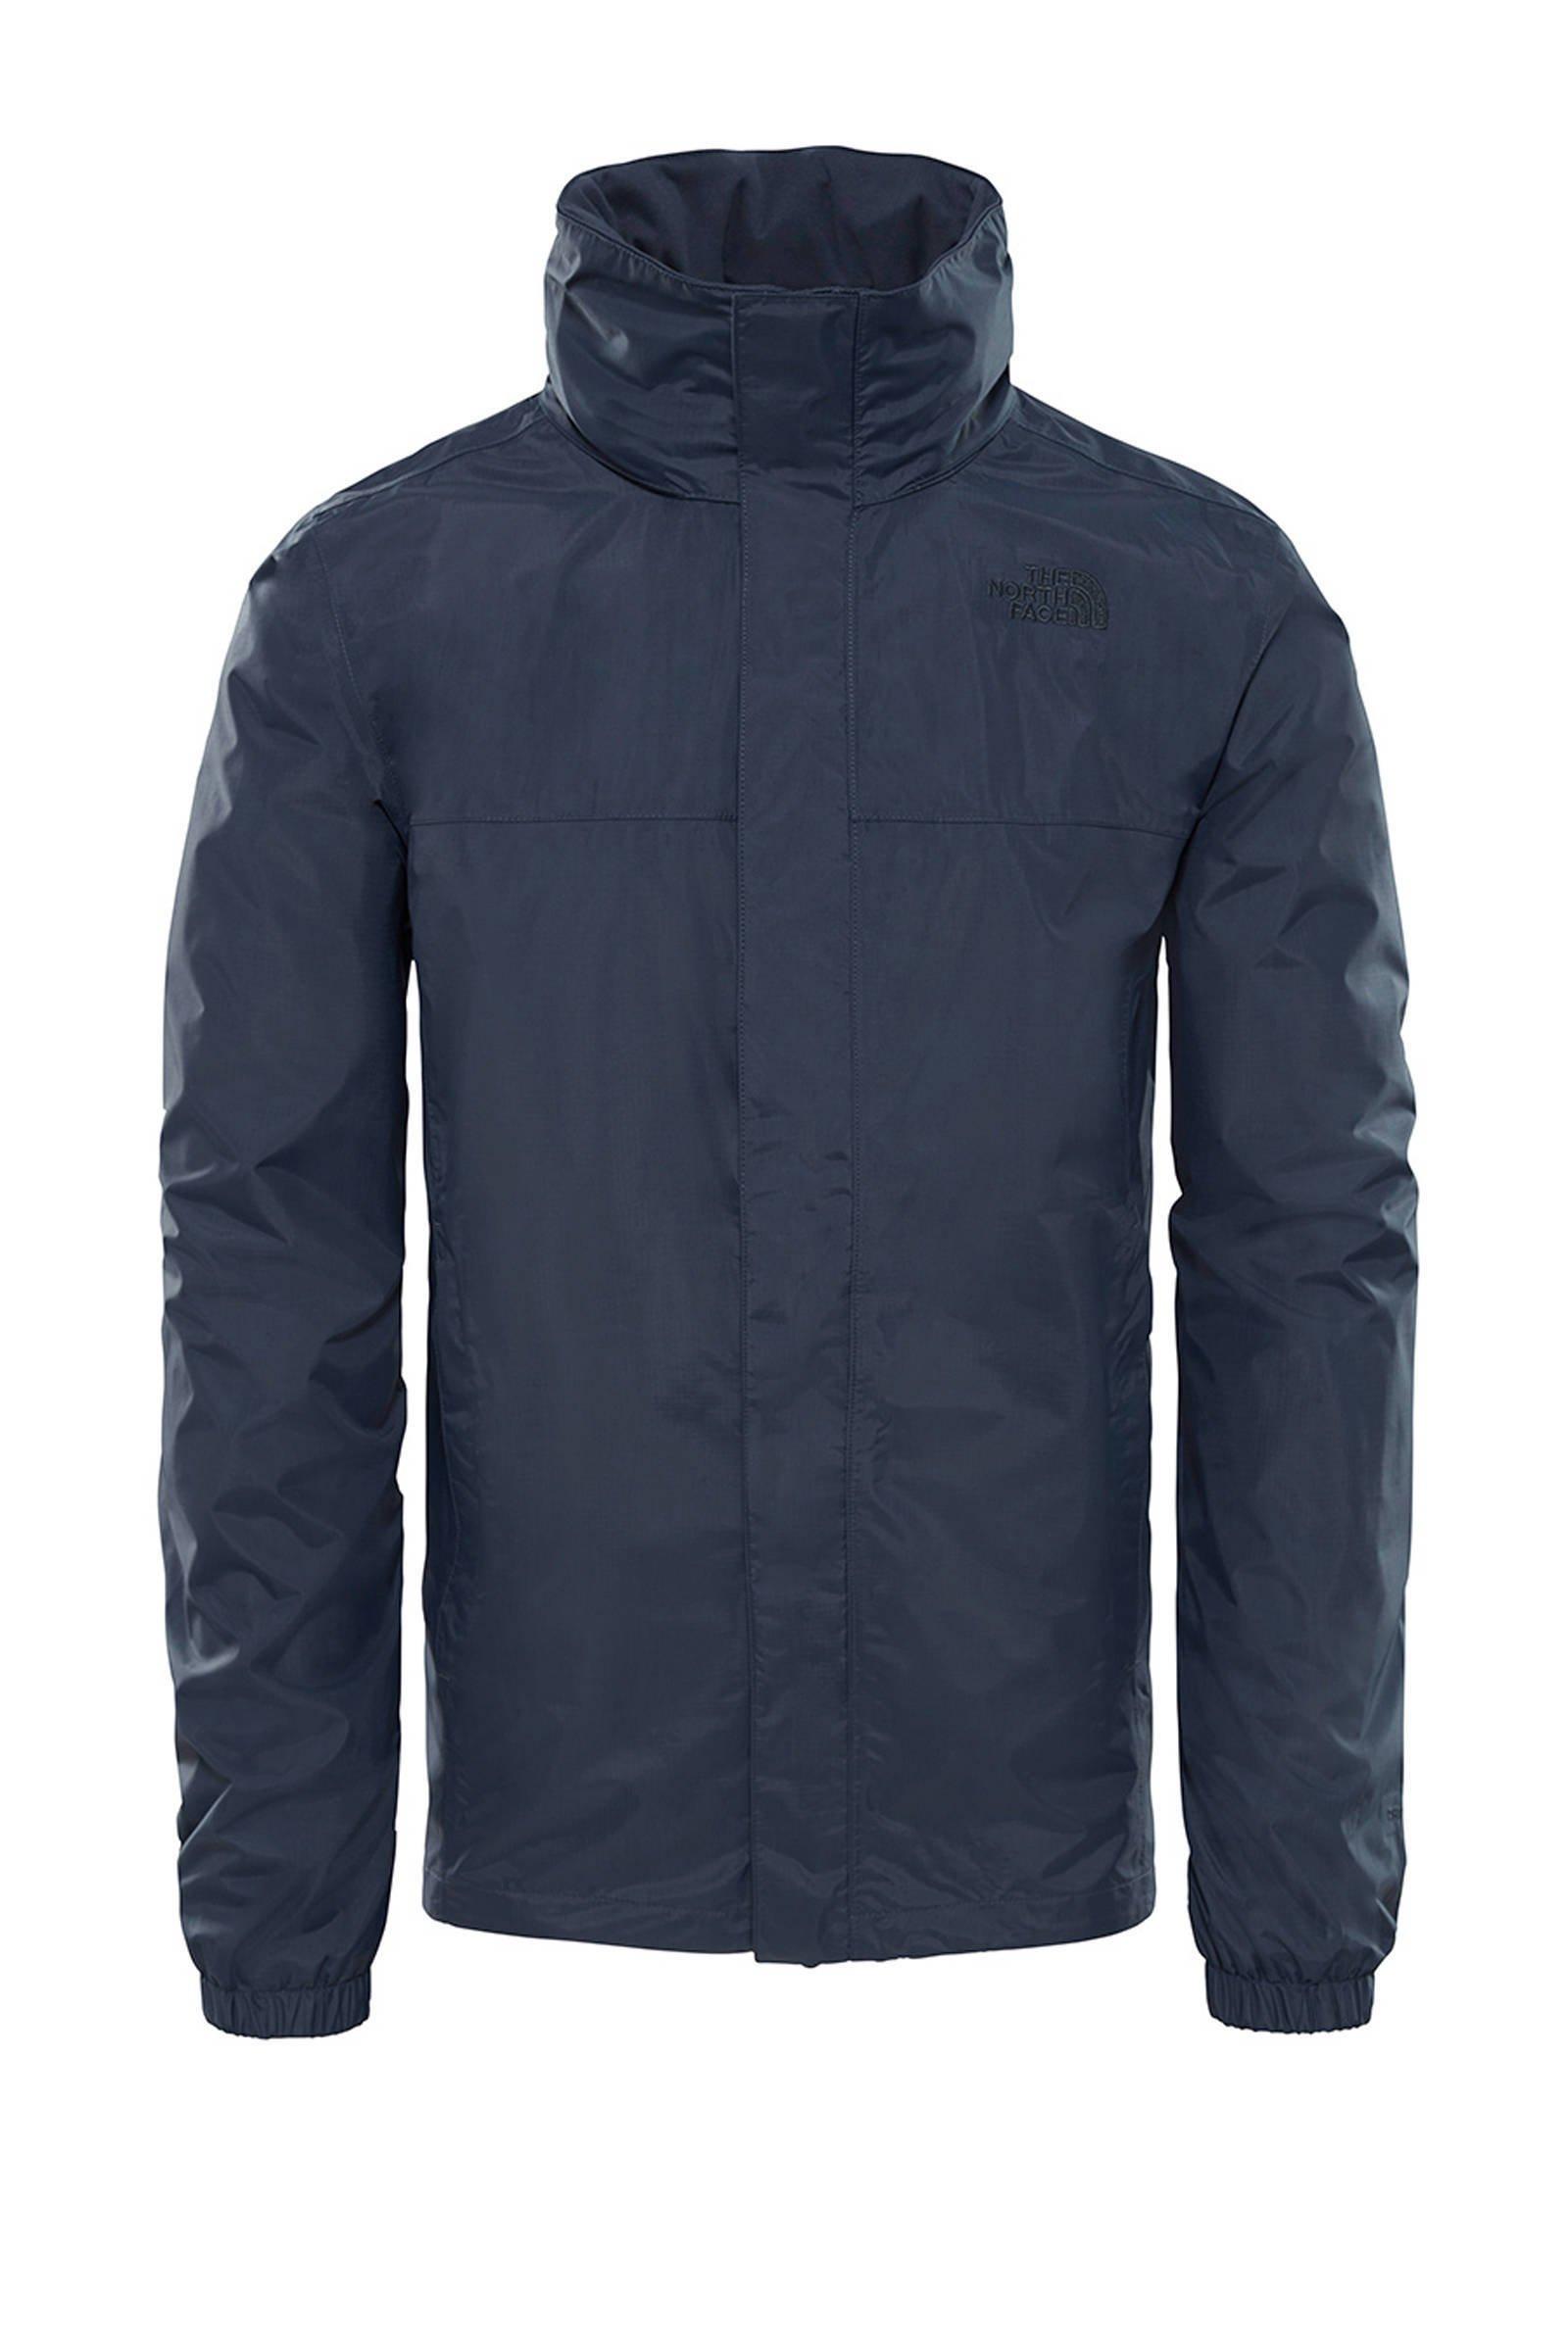 outdoor jas Resolve Parka donkerblauwblauw